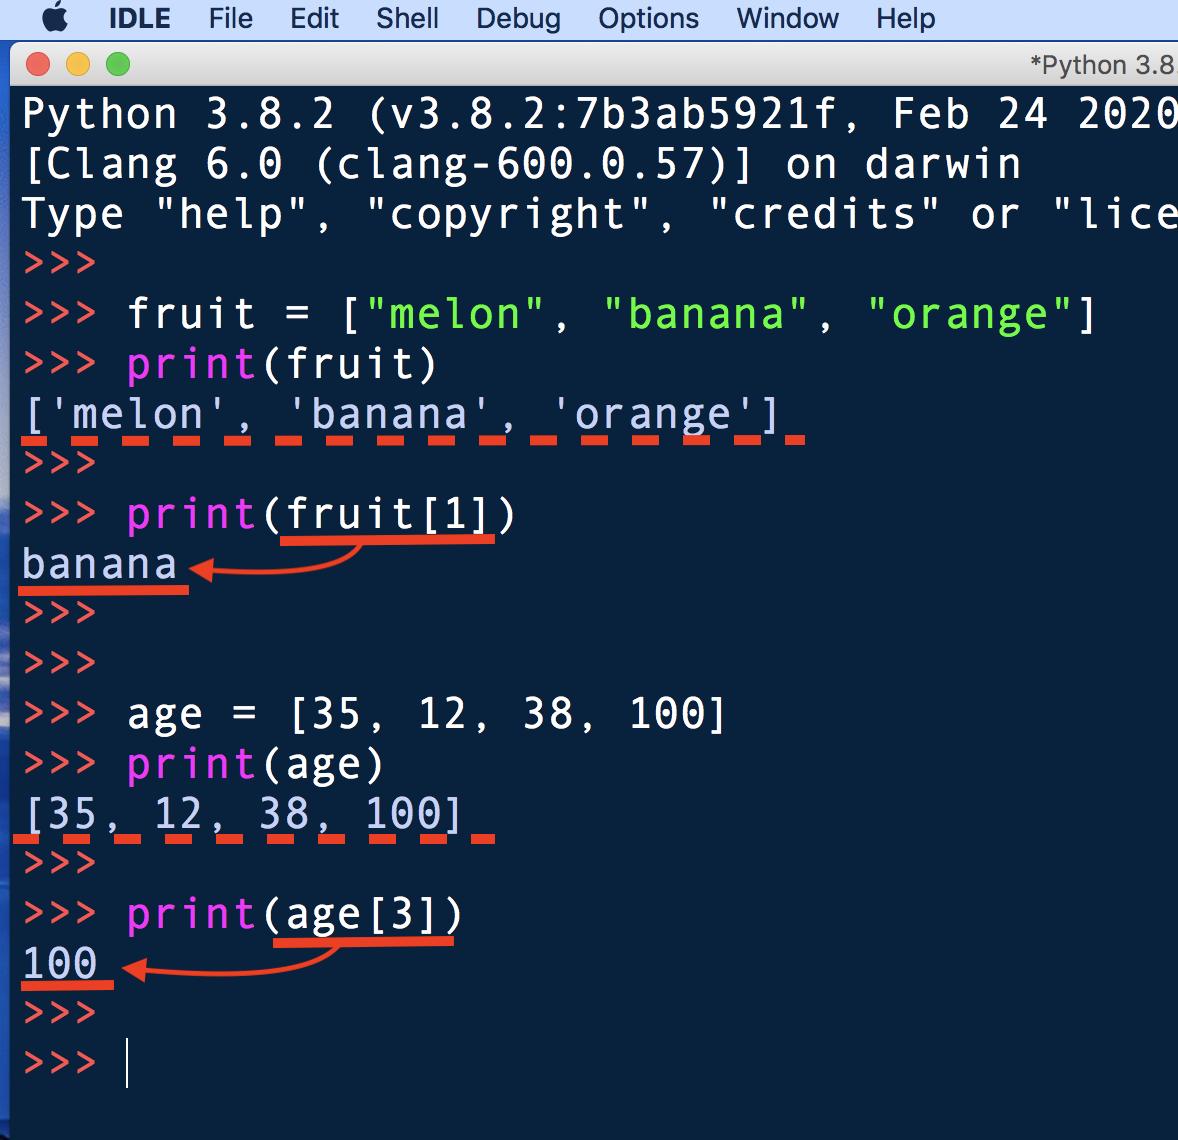 Pythonの対話モードでリストの復習